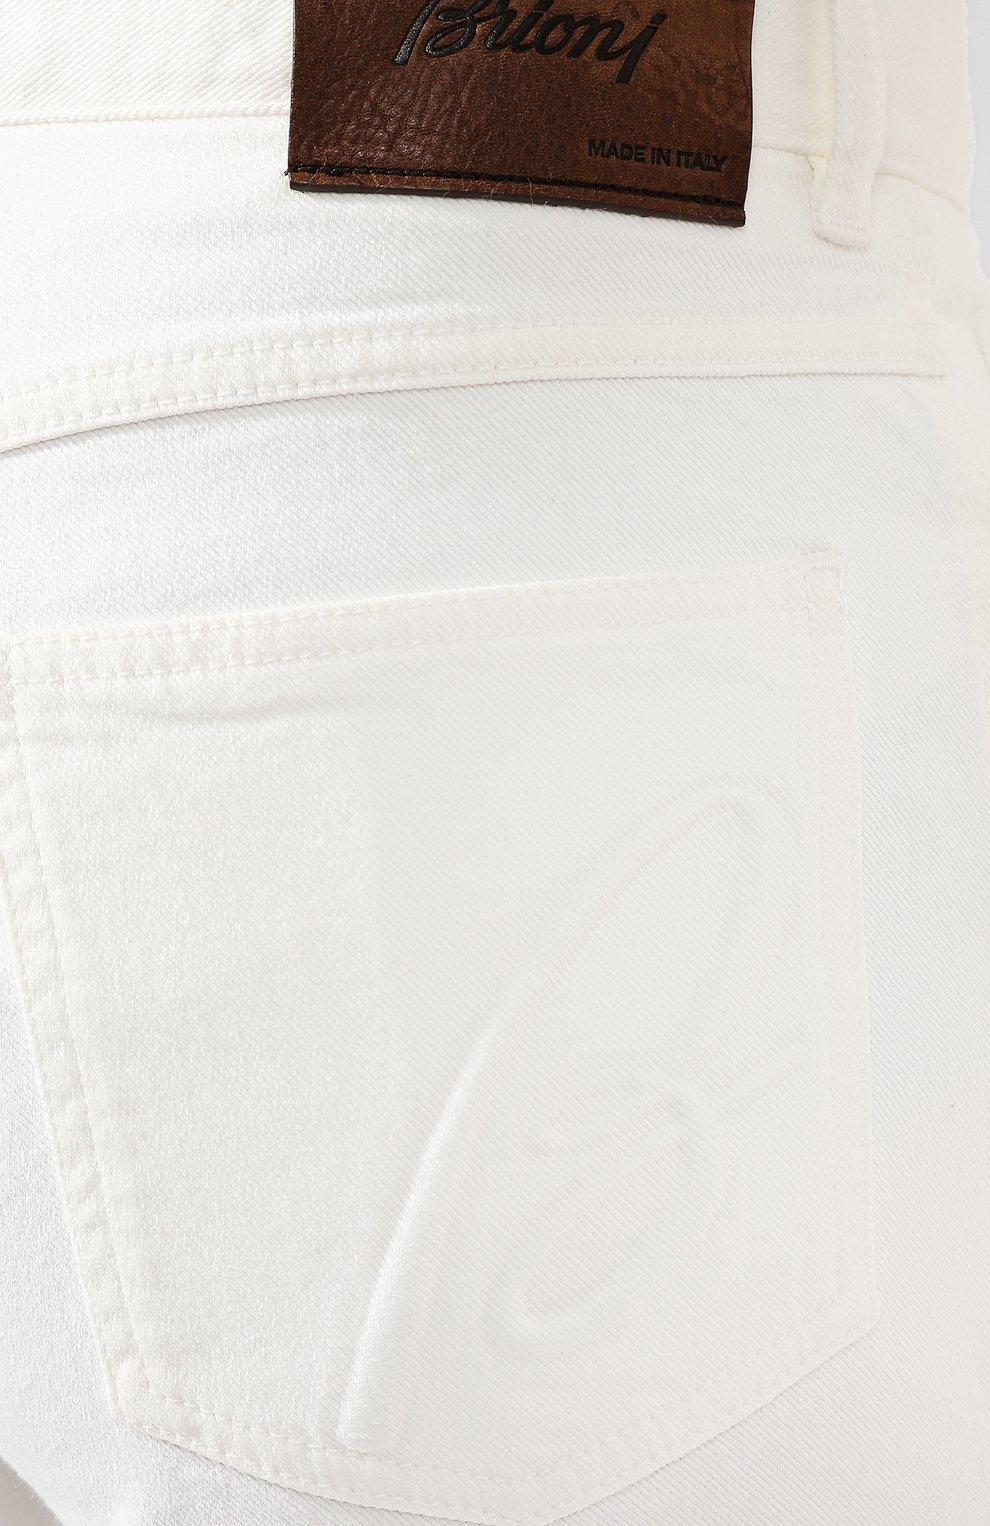 Мужские джинсы BRIONI белого цвета, арт. SPNJ0M/08T01/STELVI0 | Фото 5